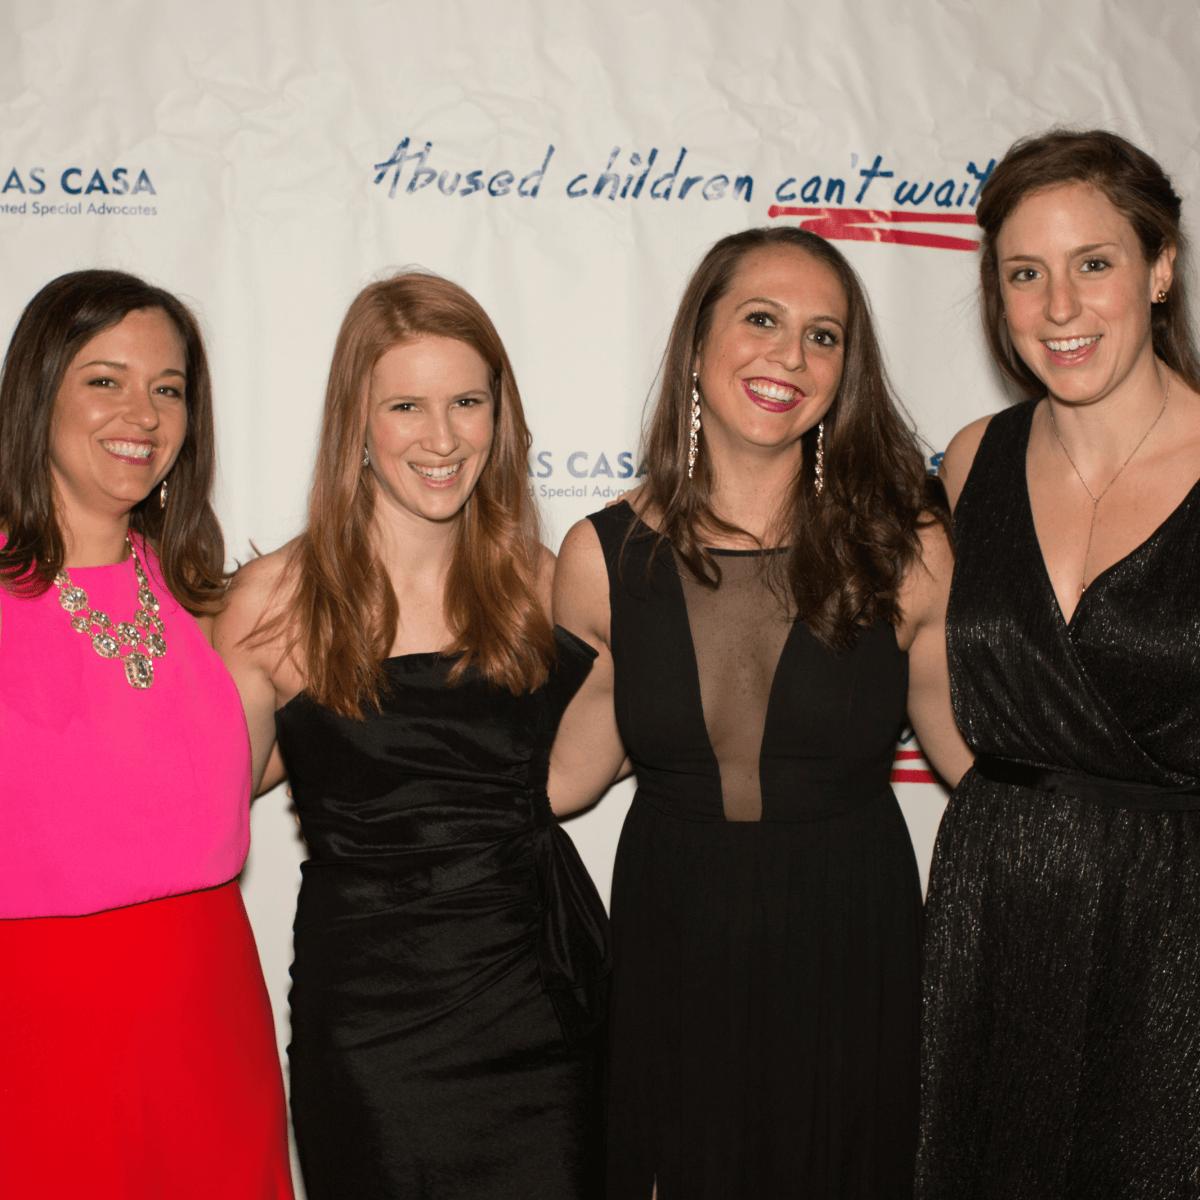 Jenny Jones, Annika Lewis, Ashley Tobin, Meredith Rubin